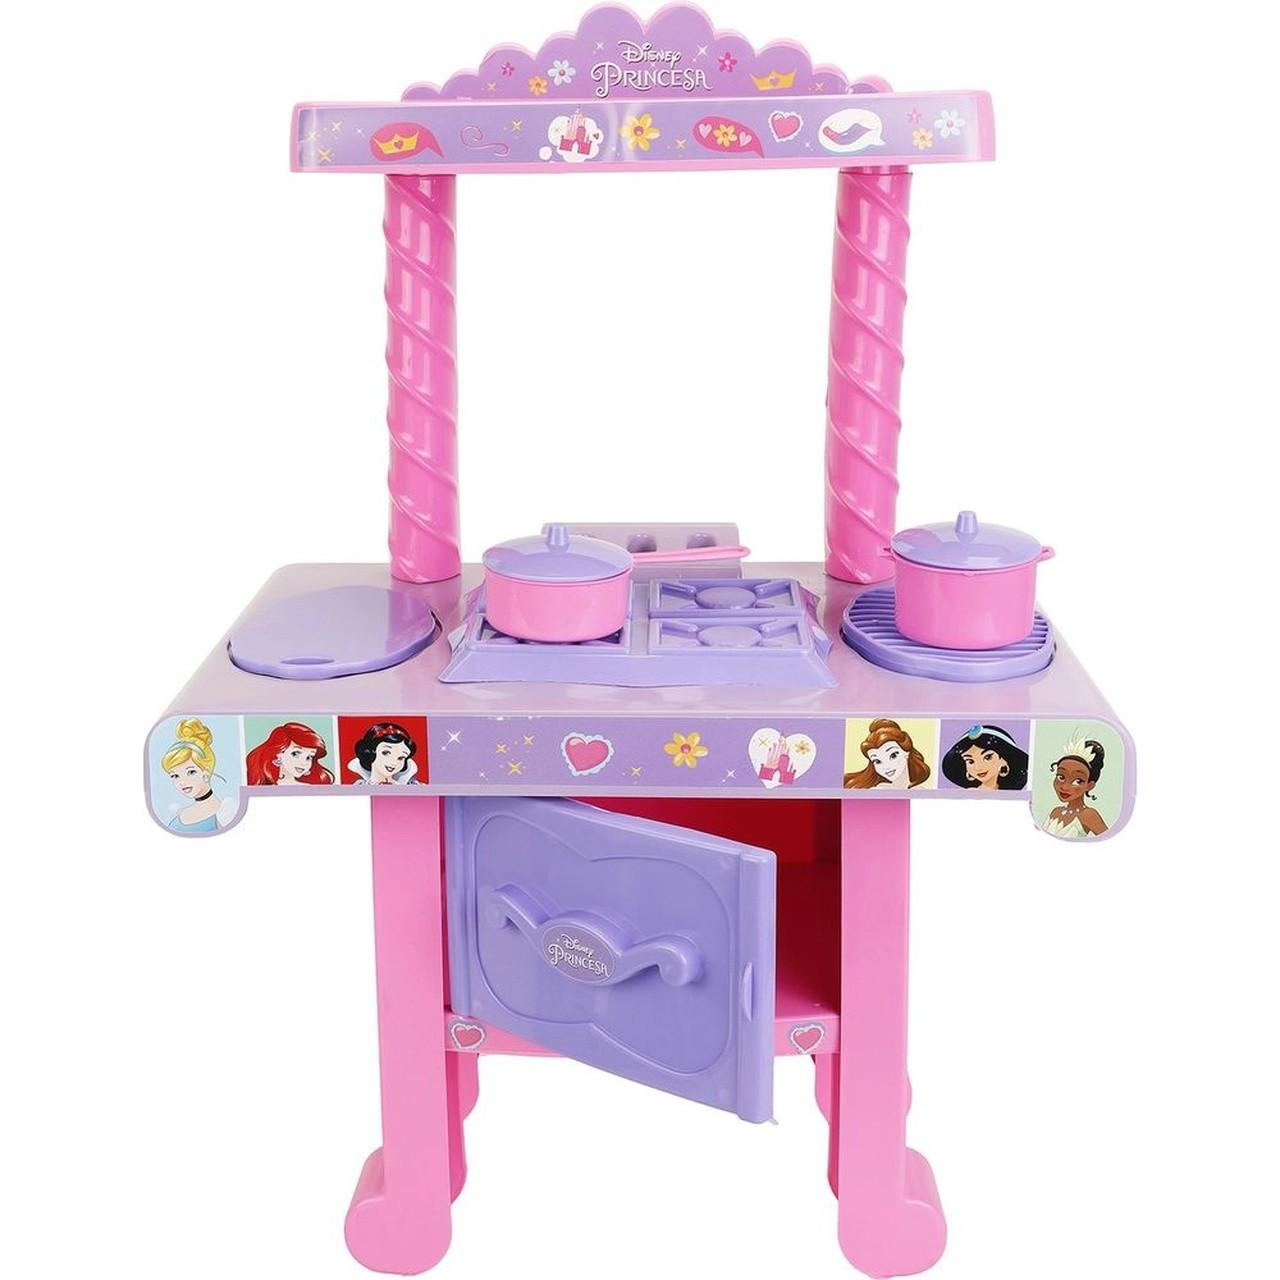 Mini Cozinha Princesas Infantil C/ Acessórios Mimo 6600